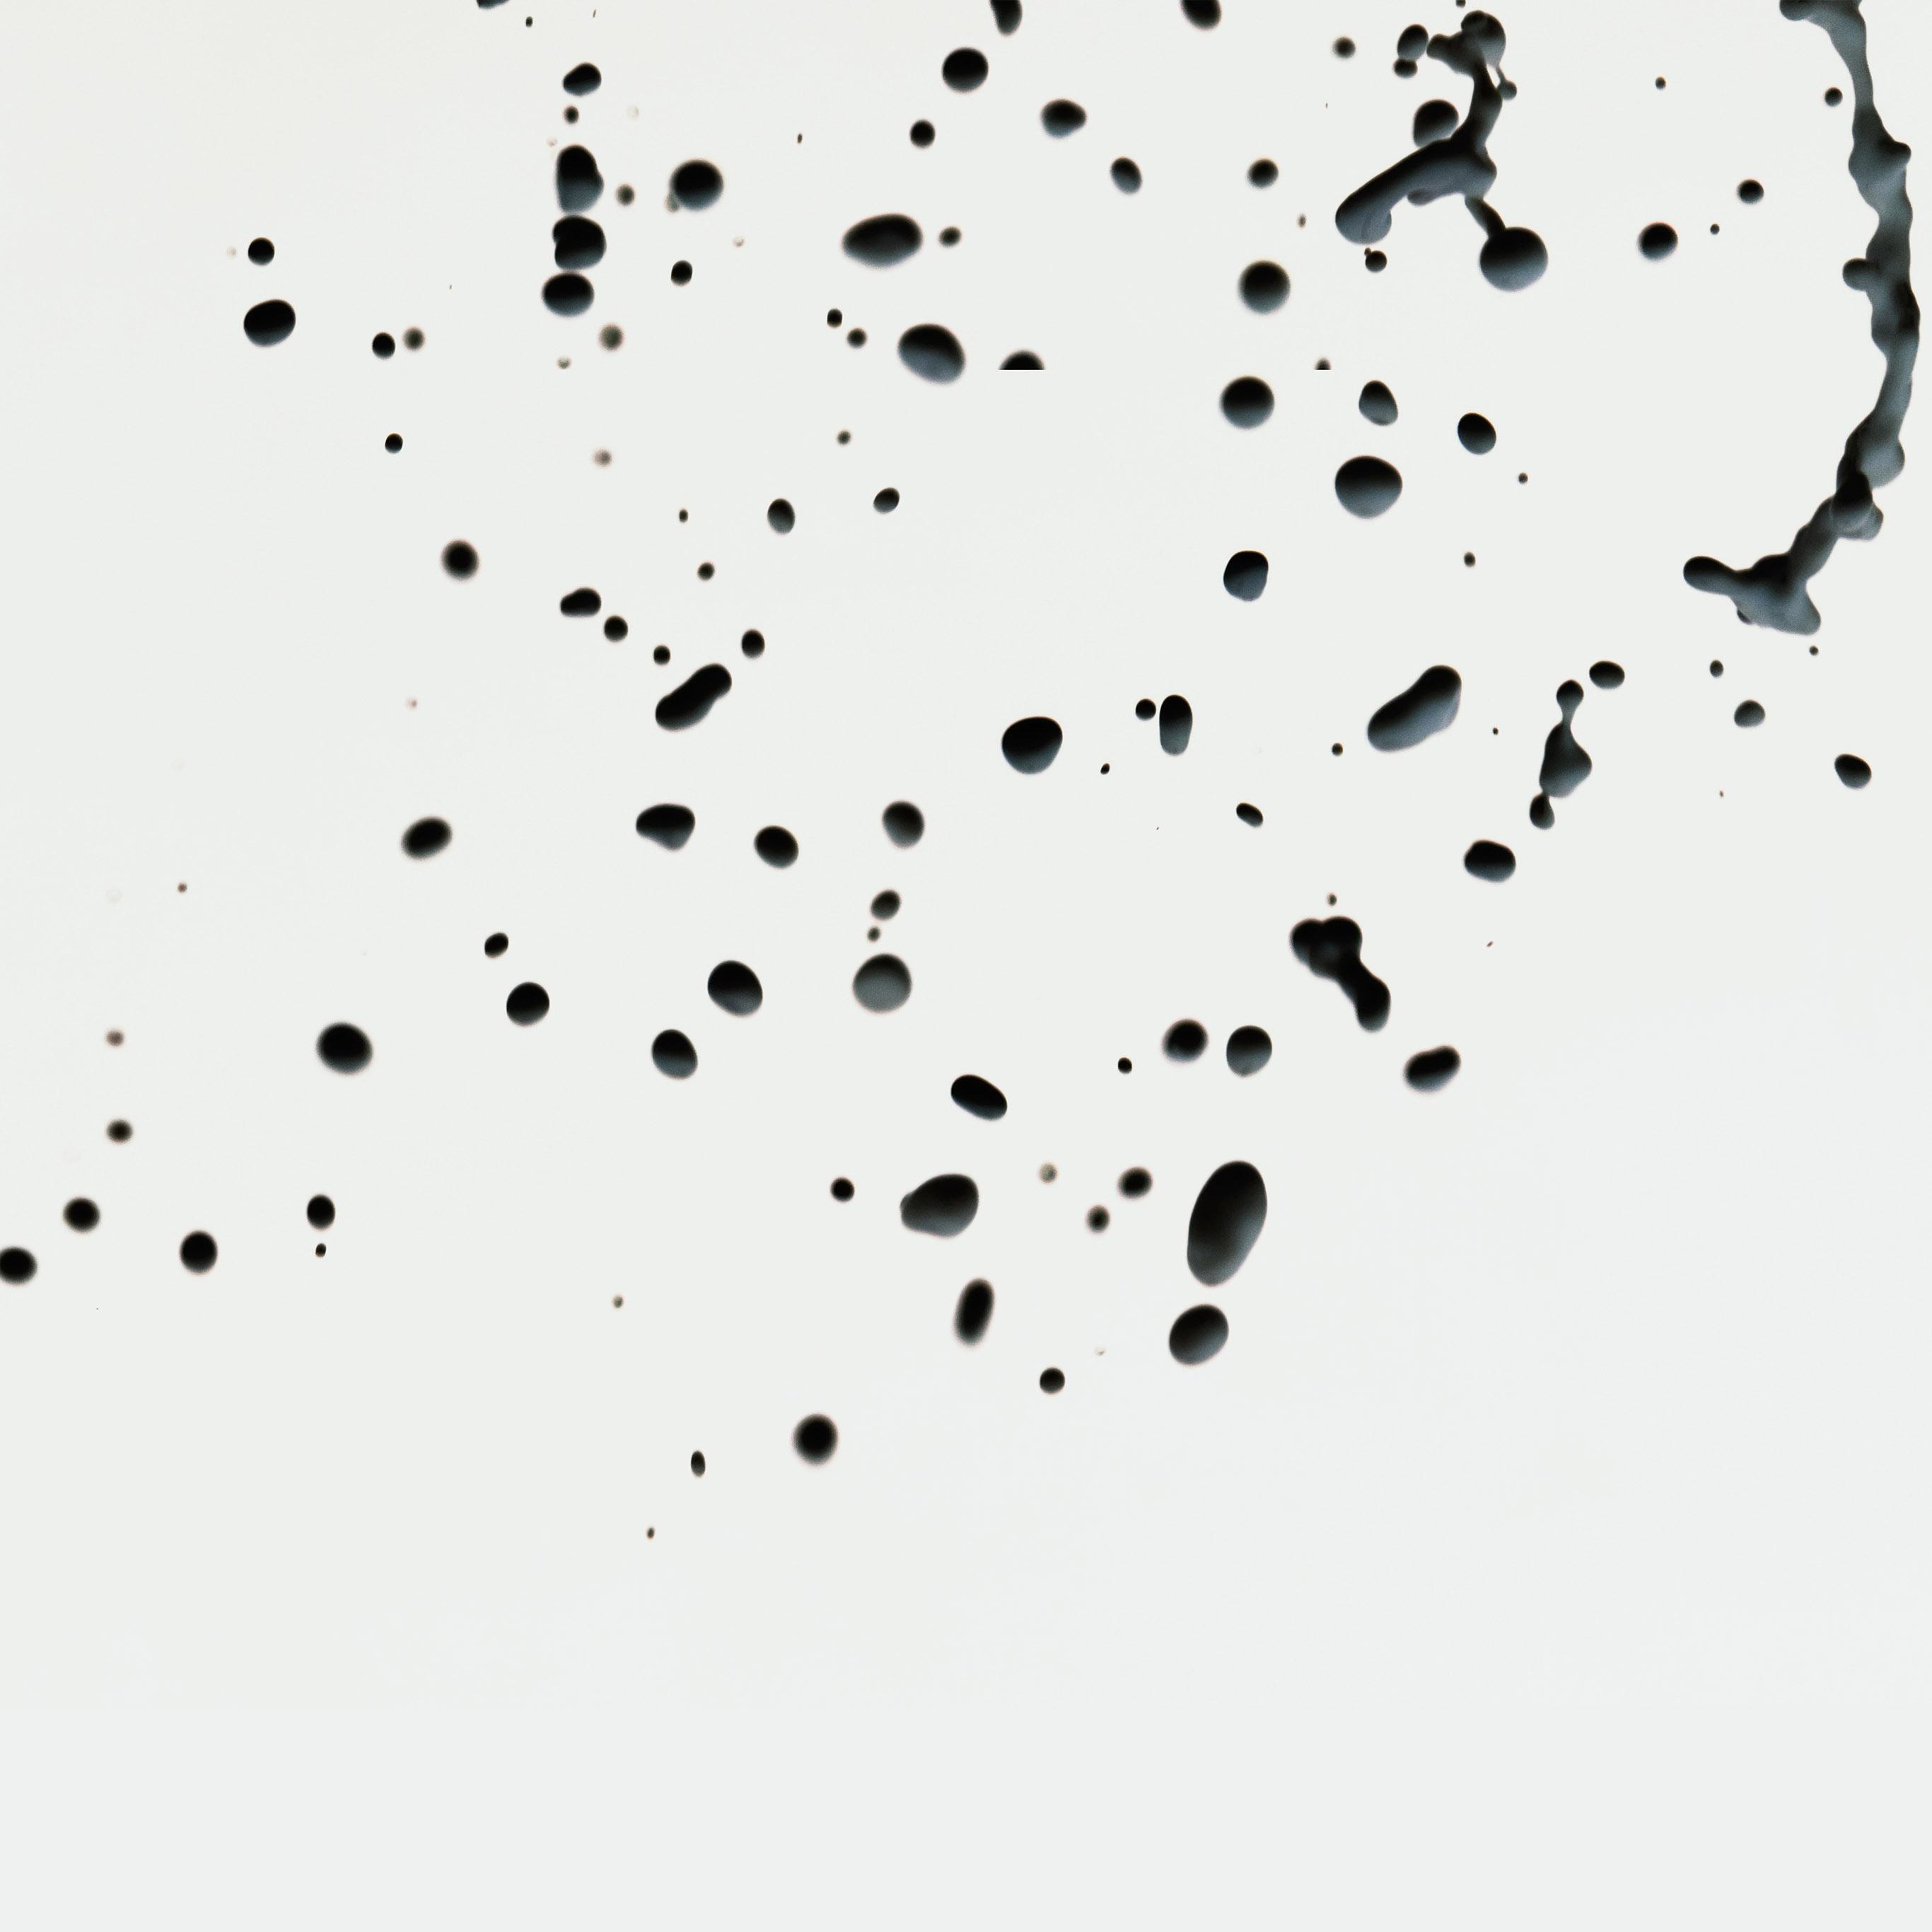 vm83-drops-white-watter-minimal-simple-pattern-wallpaper